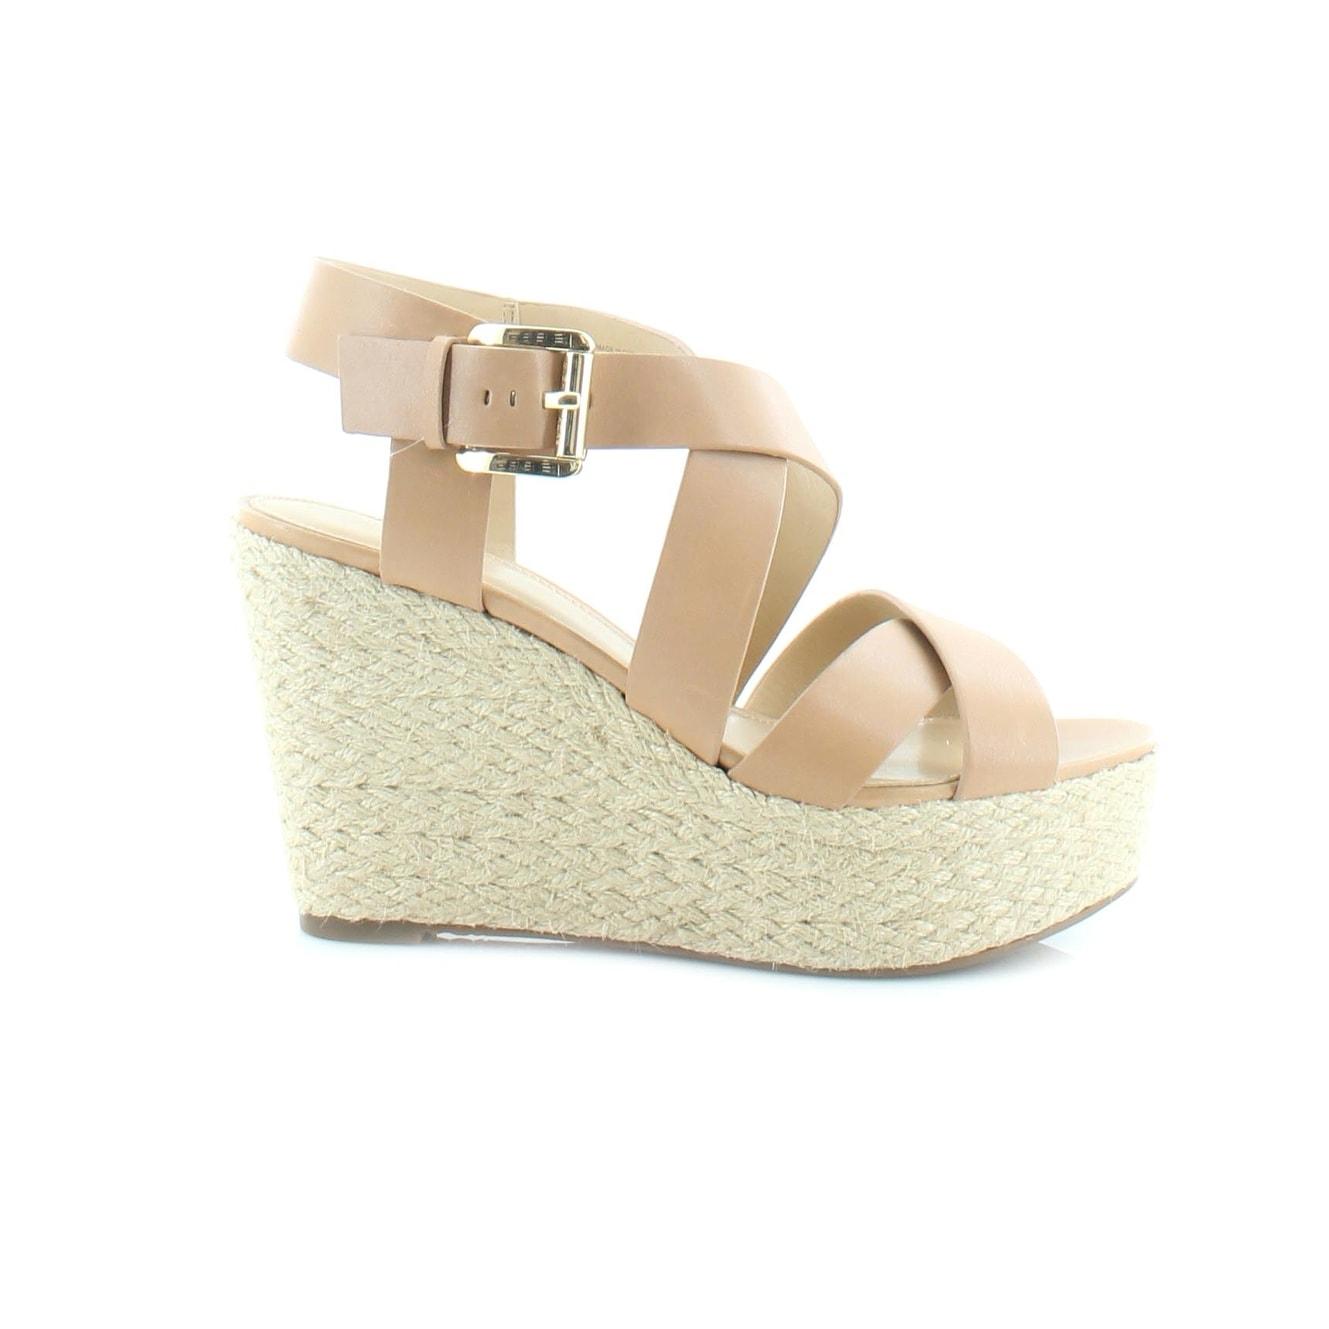 cf2c8caccf Shop MICHAEL Michael Kors Celia Wedge Women's Sandals & Flip Flops Suntan -  Free Shipping Today - Overstock - 18289164